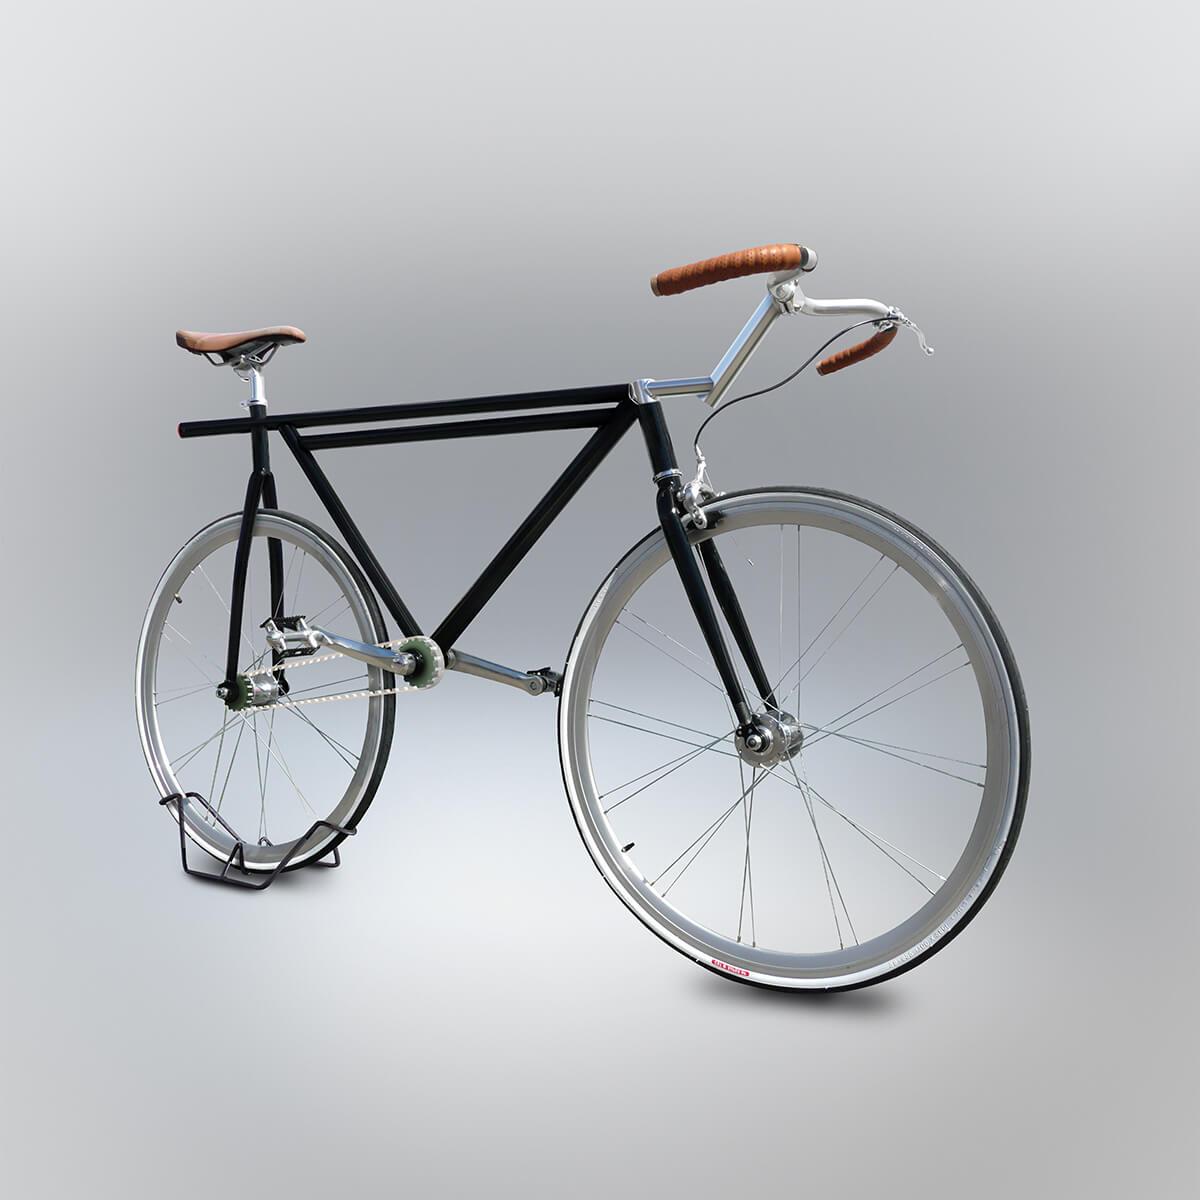 gianluca-gimini-bikes-14